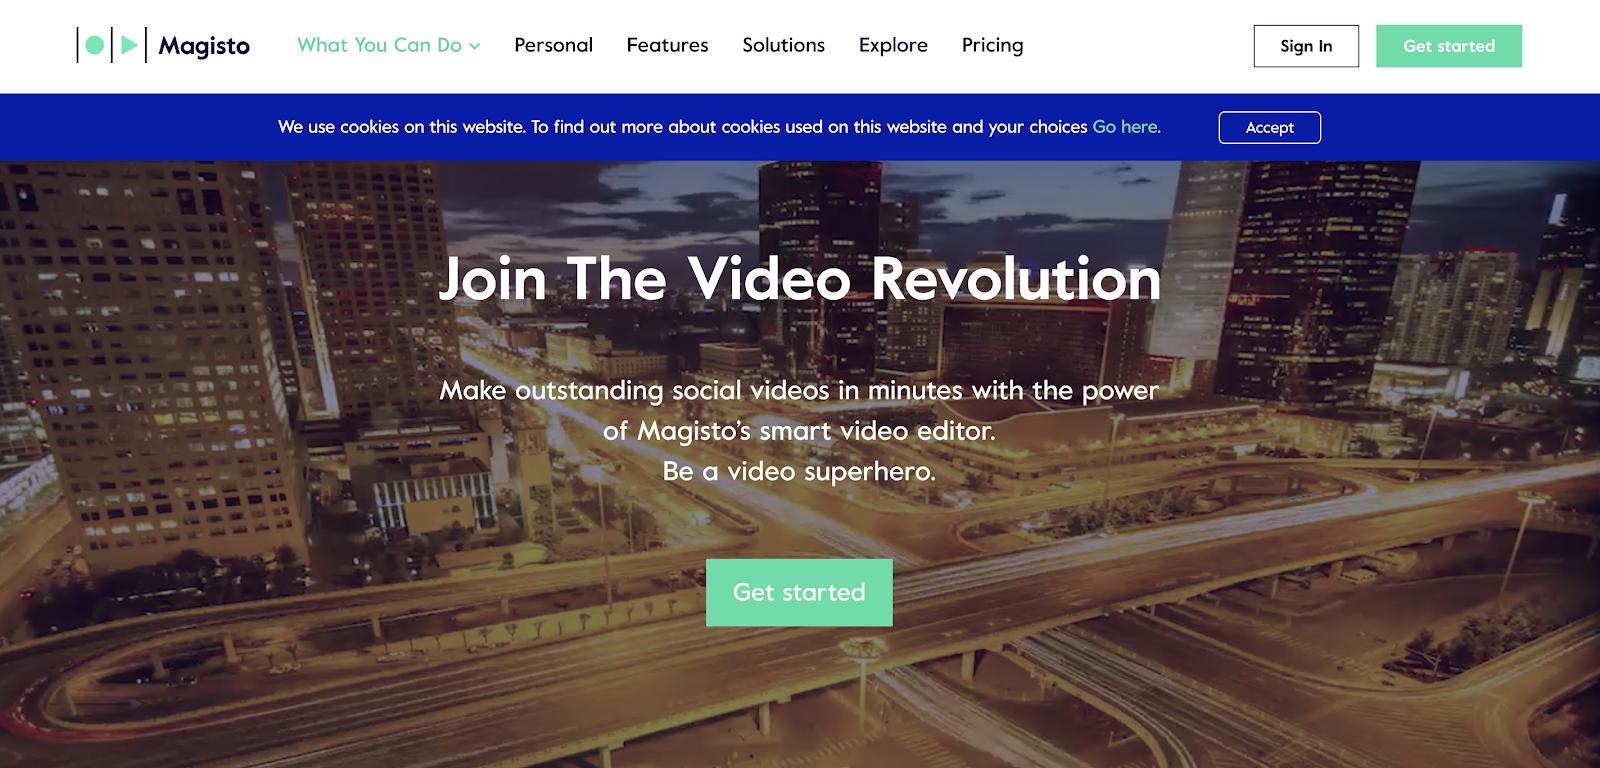 Magisto video editing software homepage